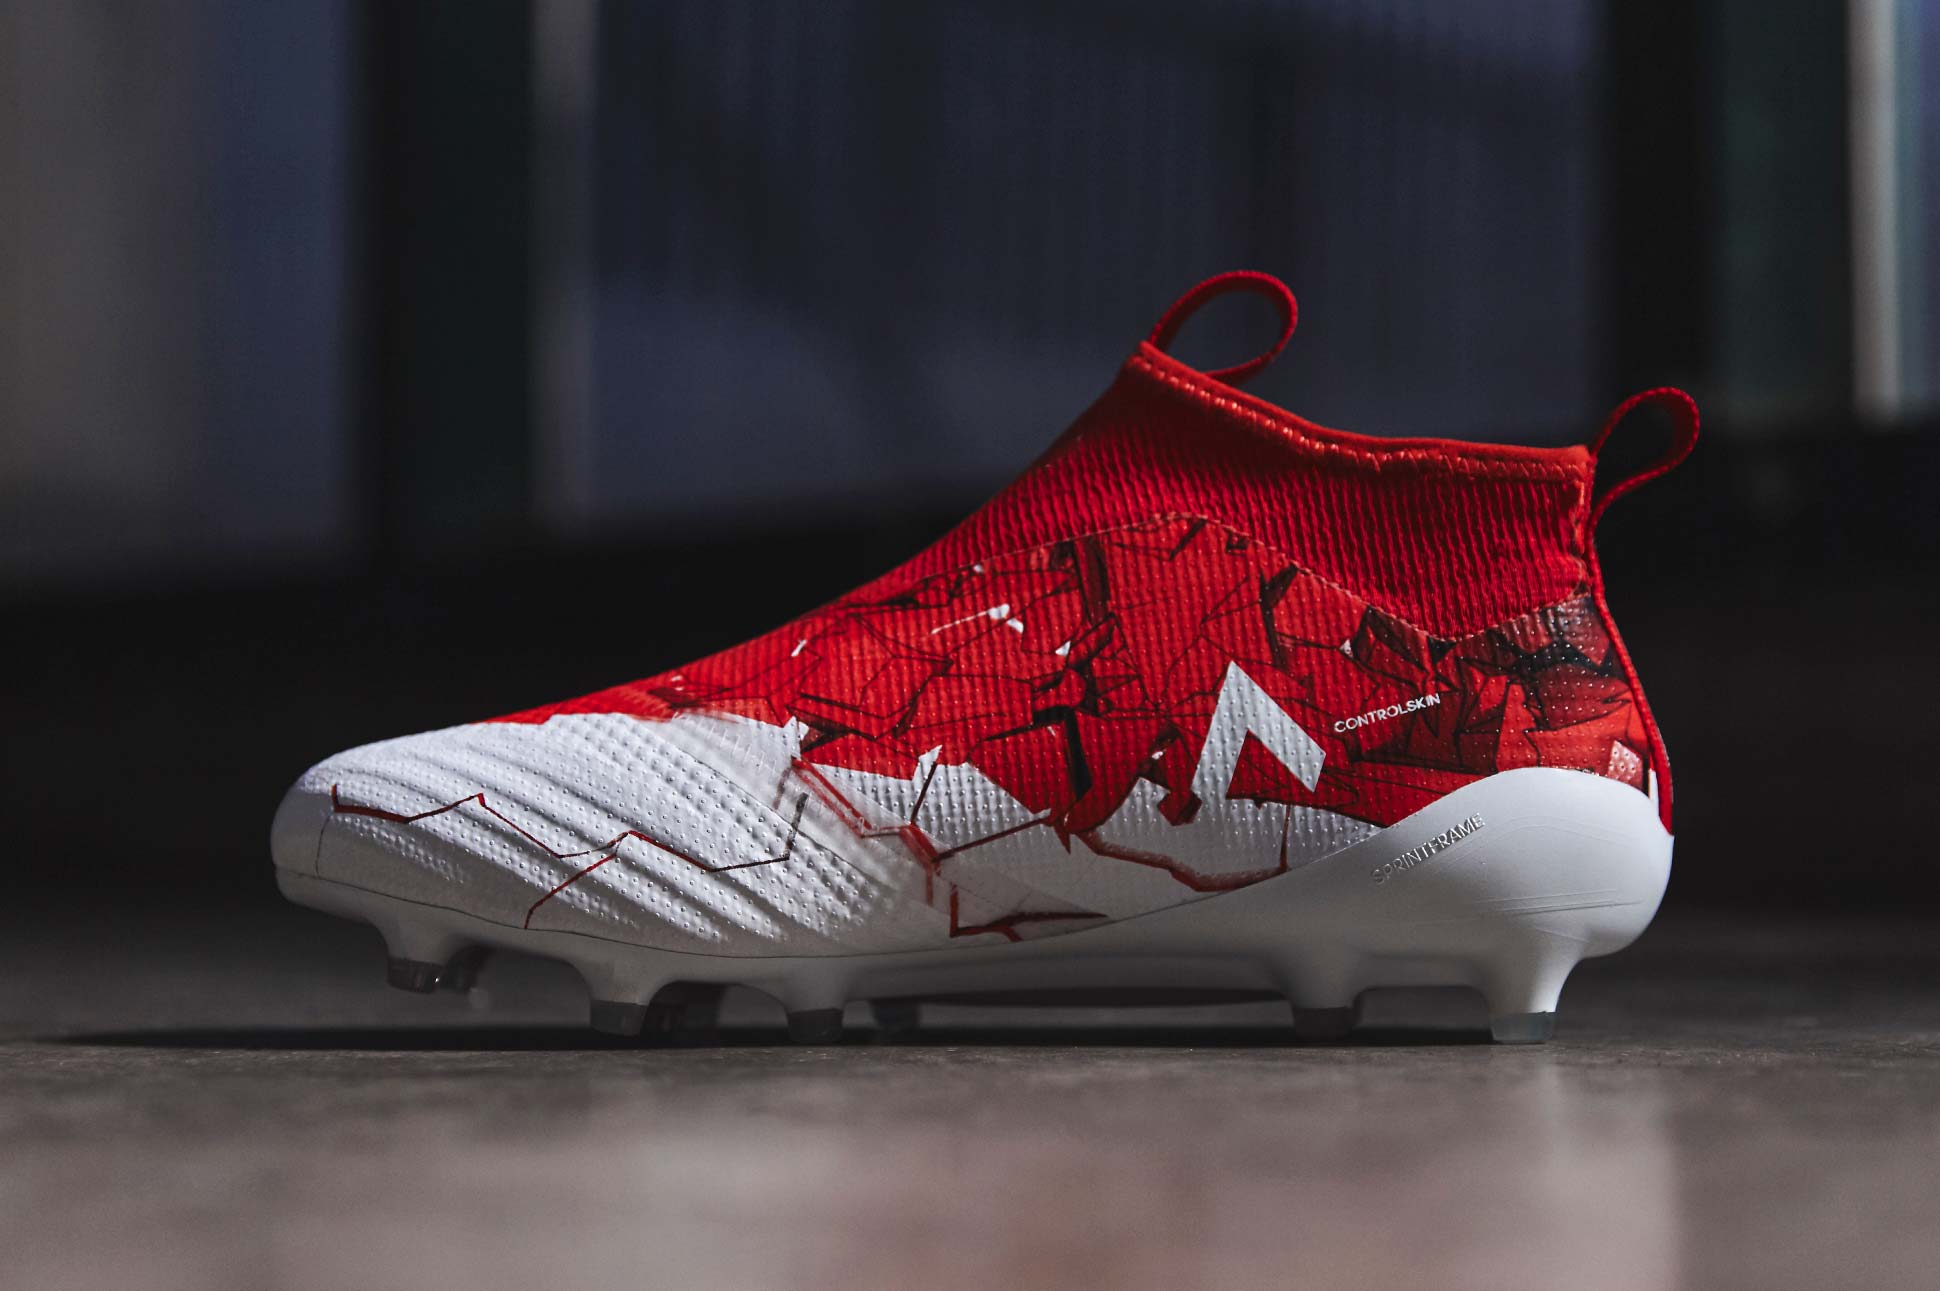 08f9934a4 adidas ACE 17+ Purecontrol Confederations Cup Football Boots ...